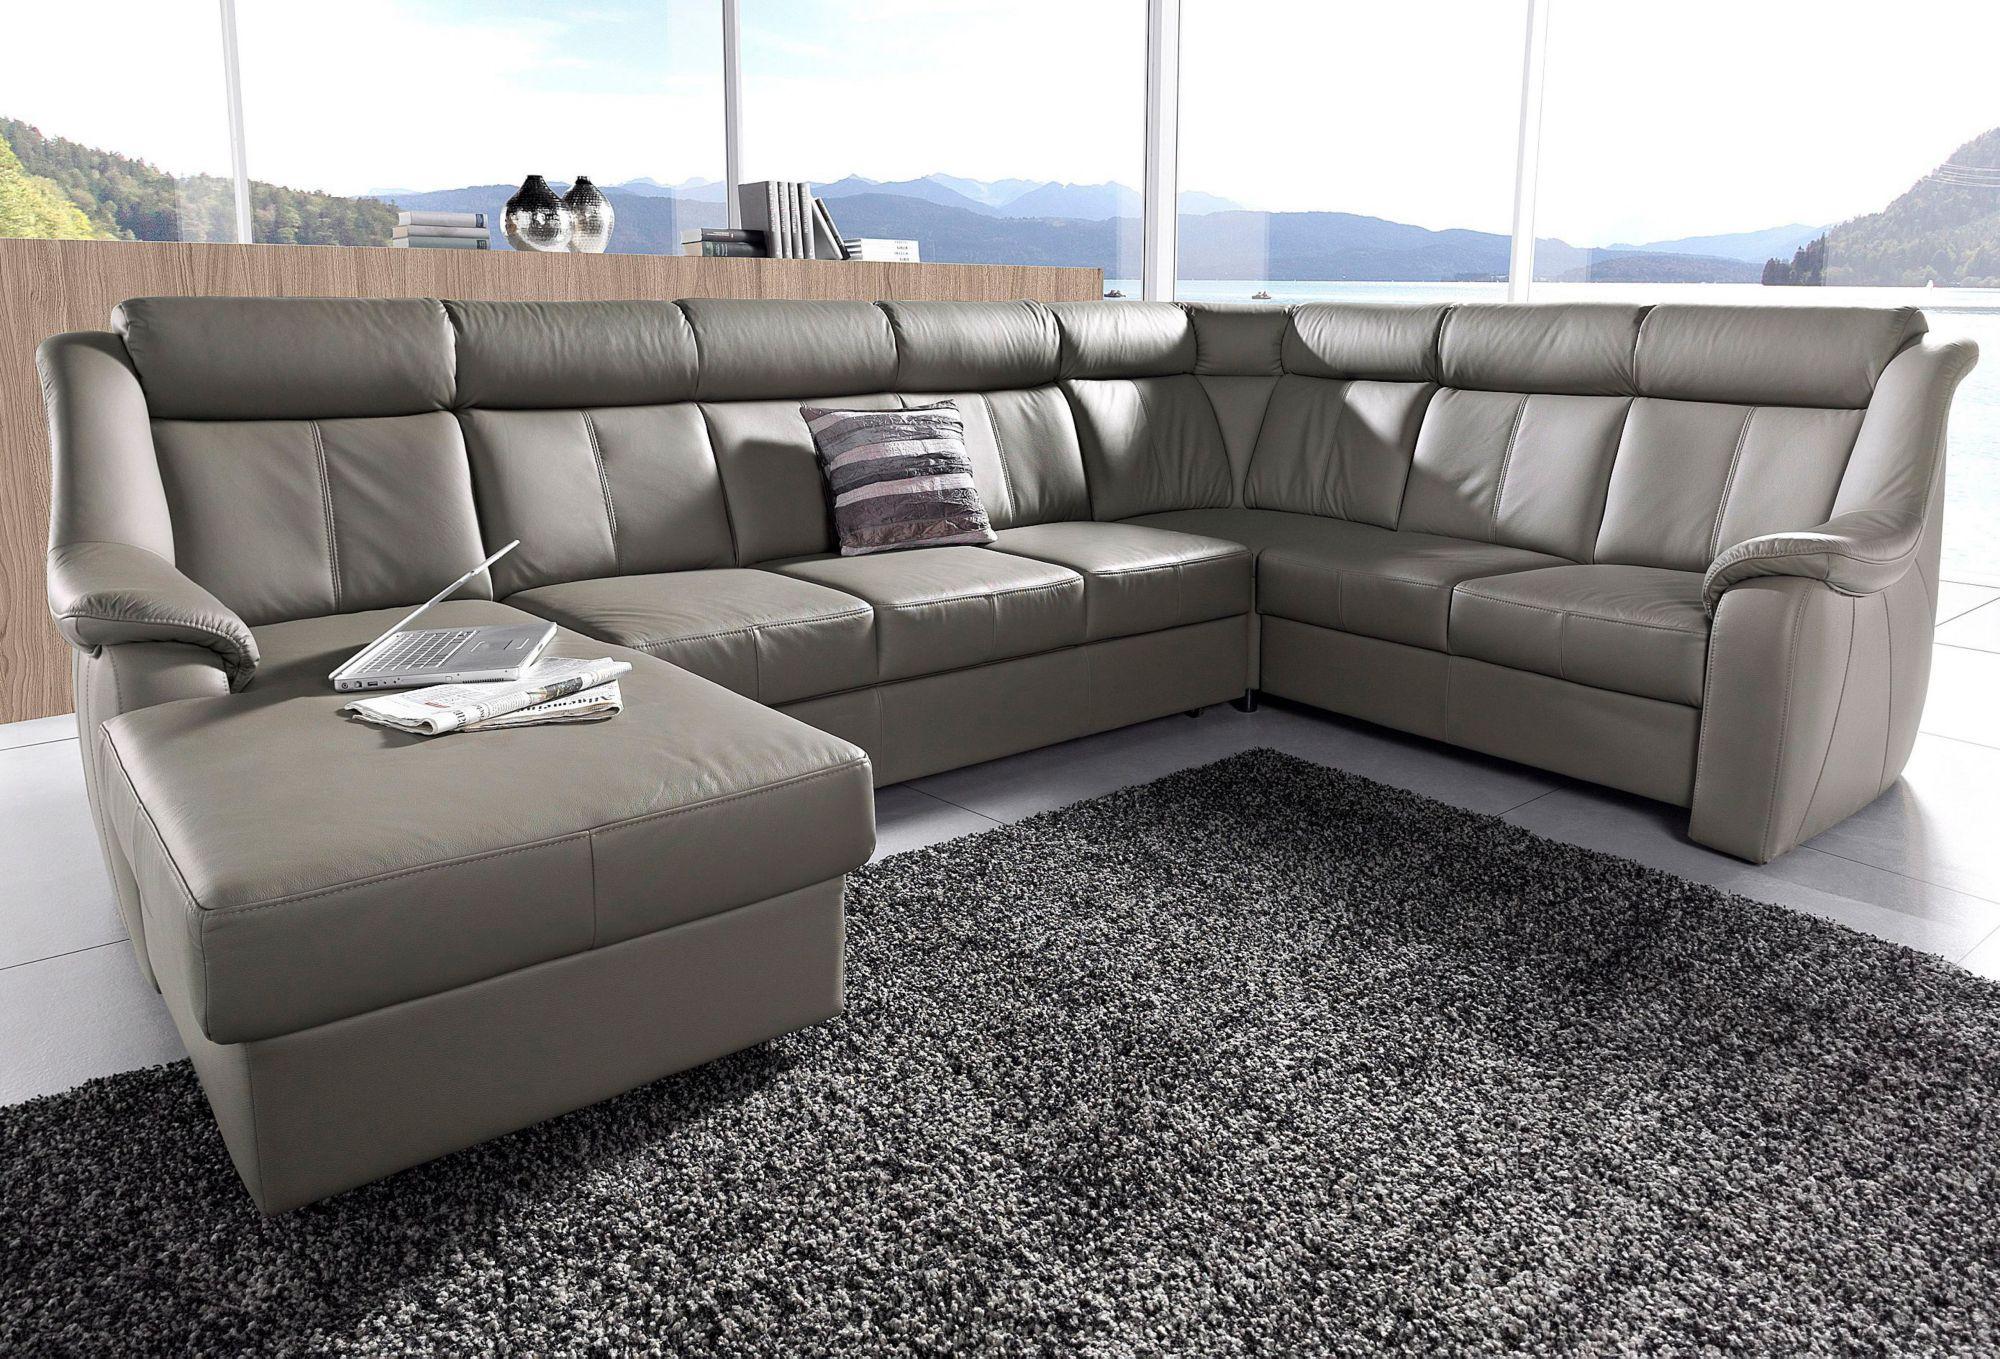 wohnlandschaft wahlweise mit relaxfunktion schwab versand wohnlandschaften. Black Bedroom Furniture Sets. Home Design Ideas